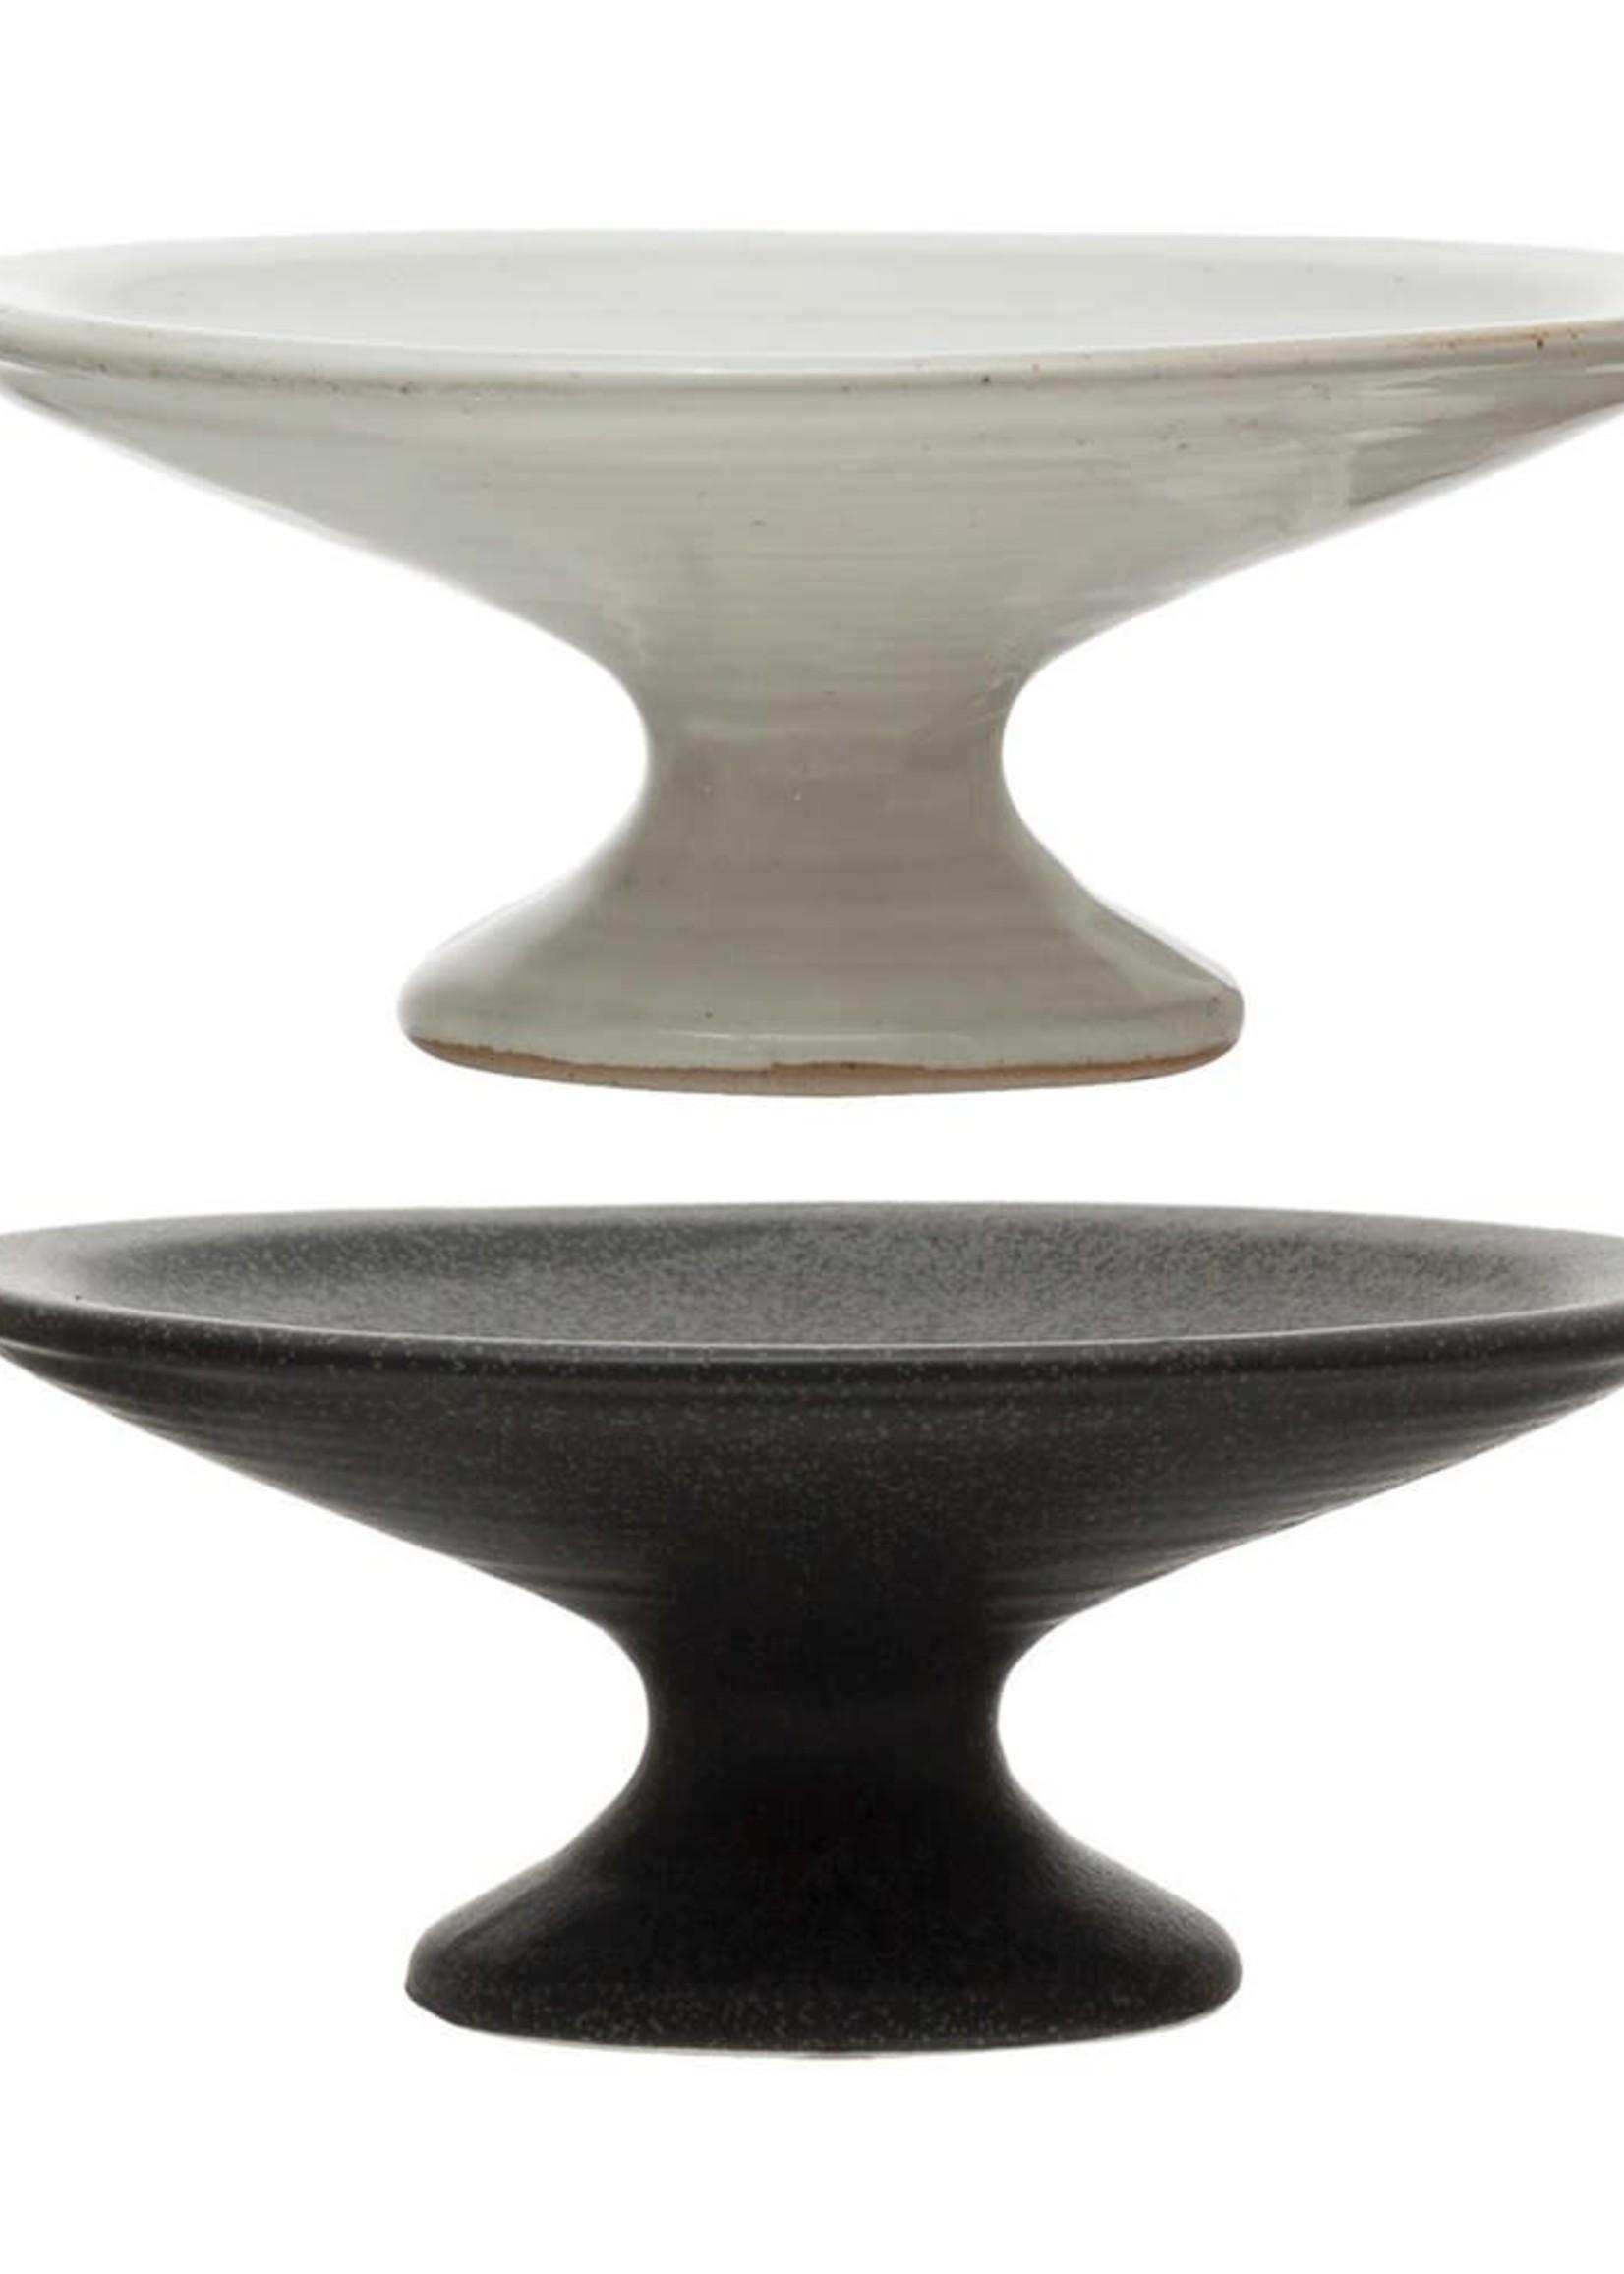 "5-1/2"" Round x 2""H Stoneware Pedestals, Matte Finish, 2 Colors"